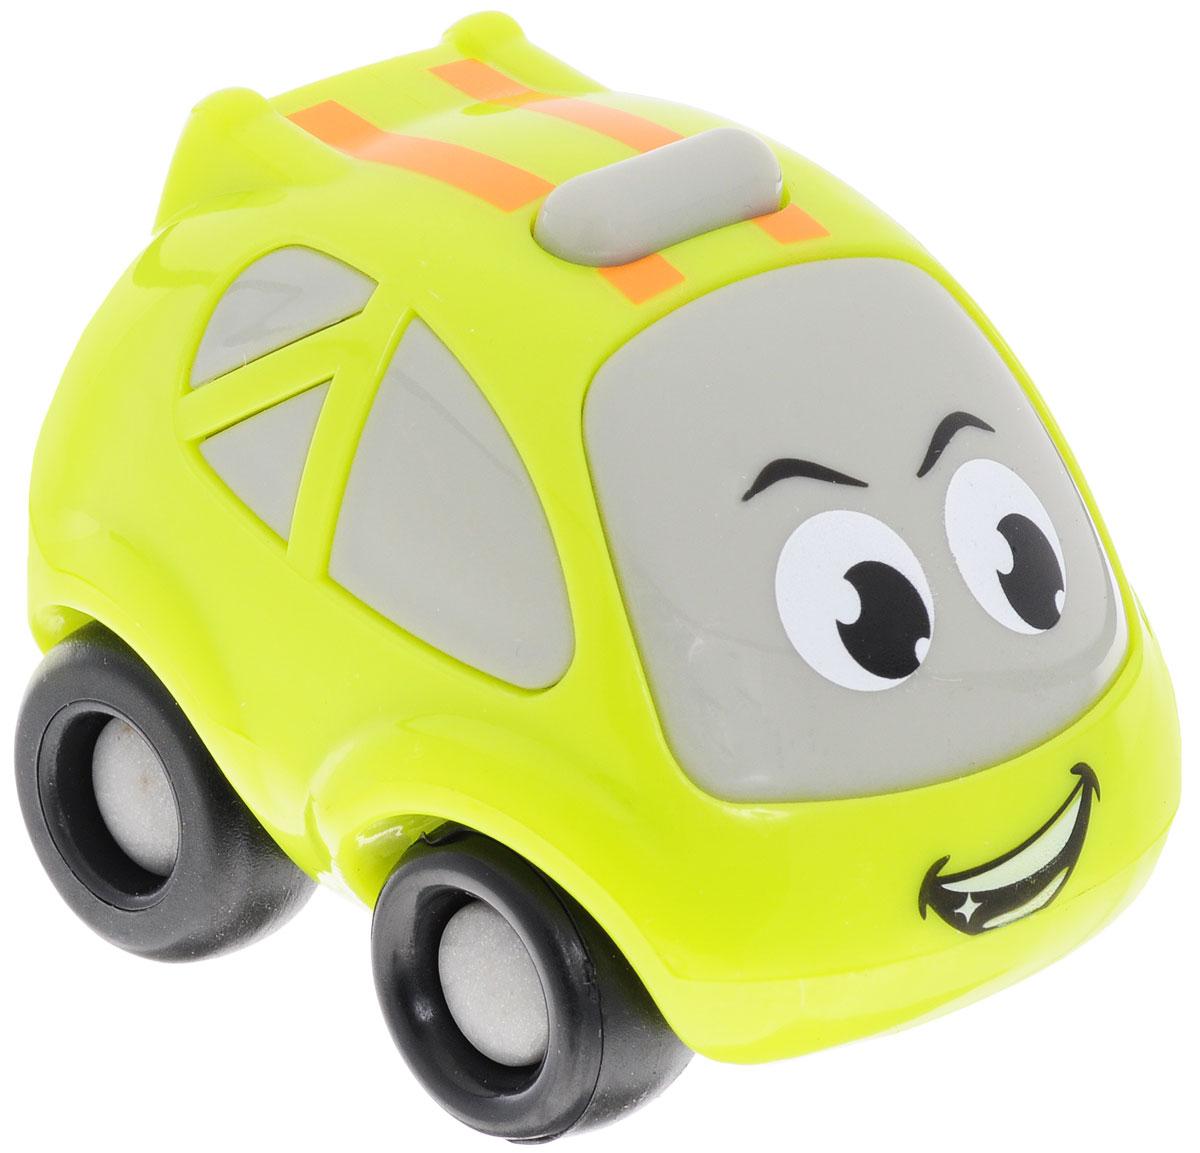 Smoby Машинка с моторчиком Vroom Planet машины smoby машинка animal planet пусковой механизм